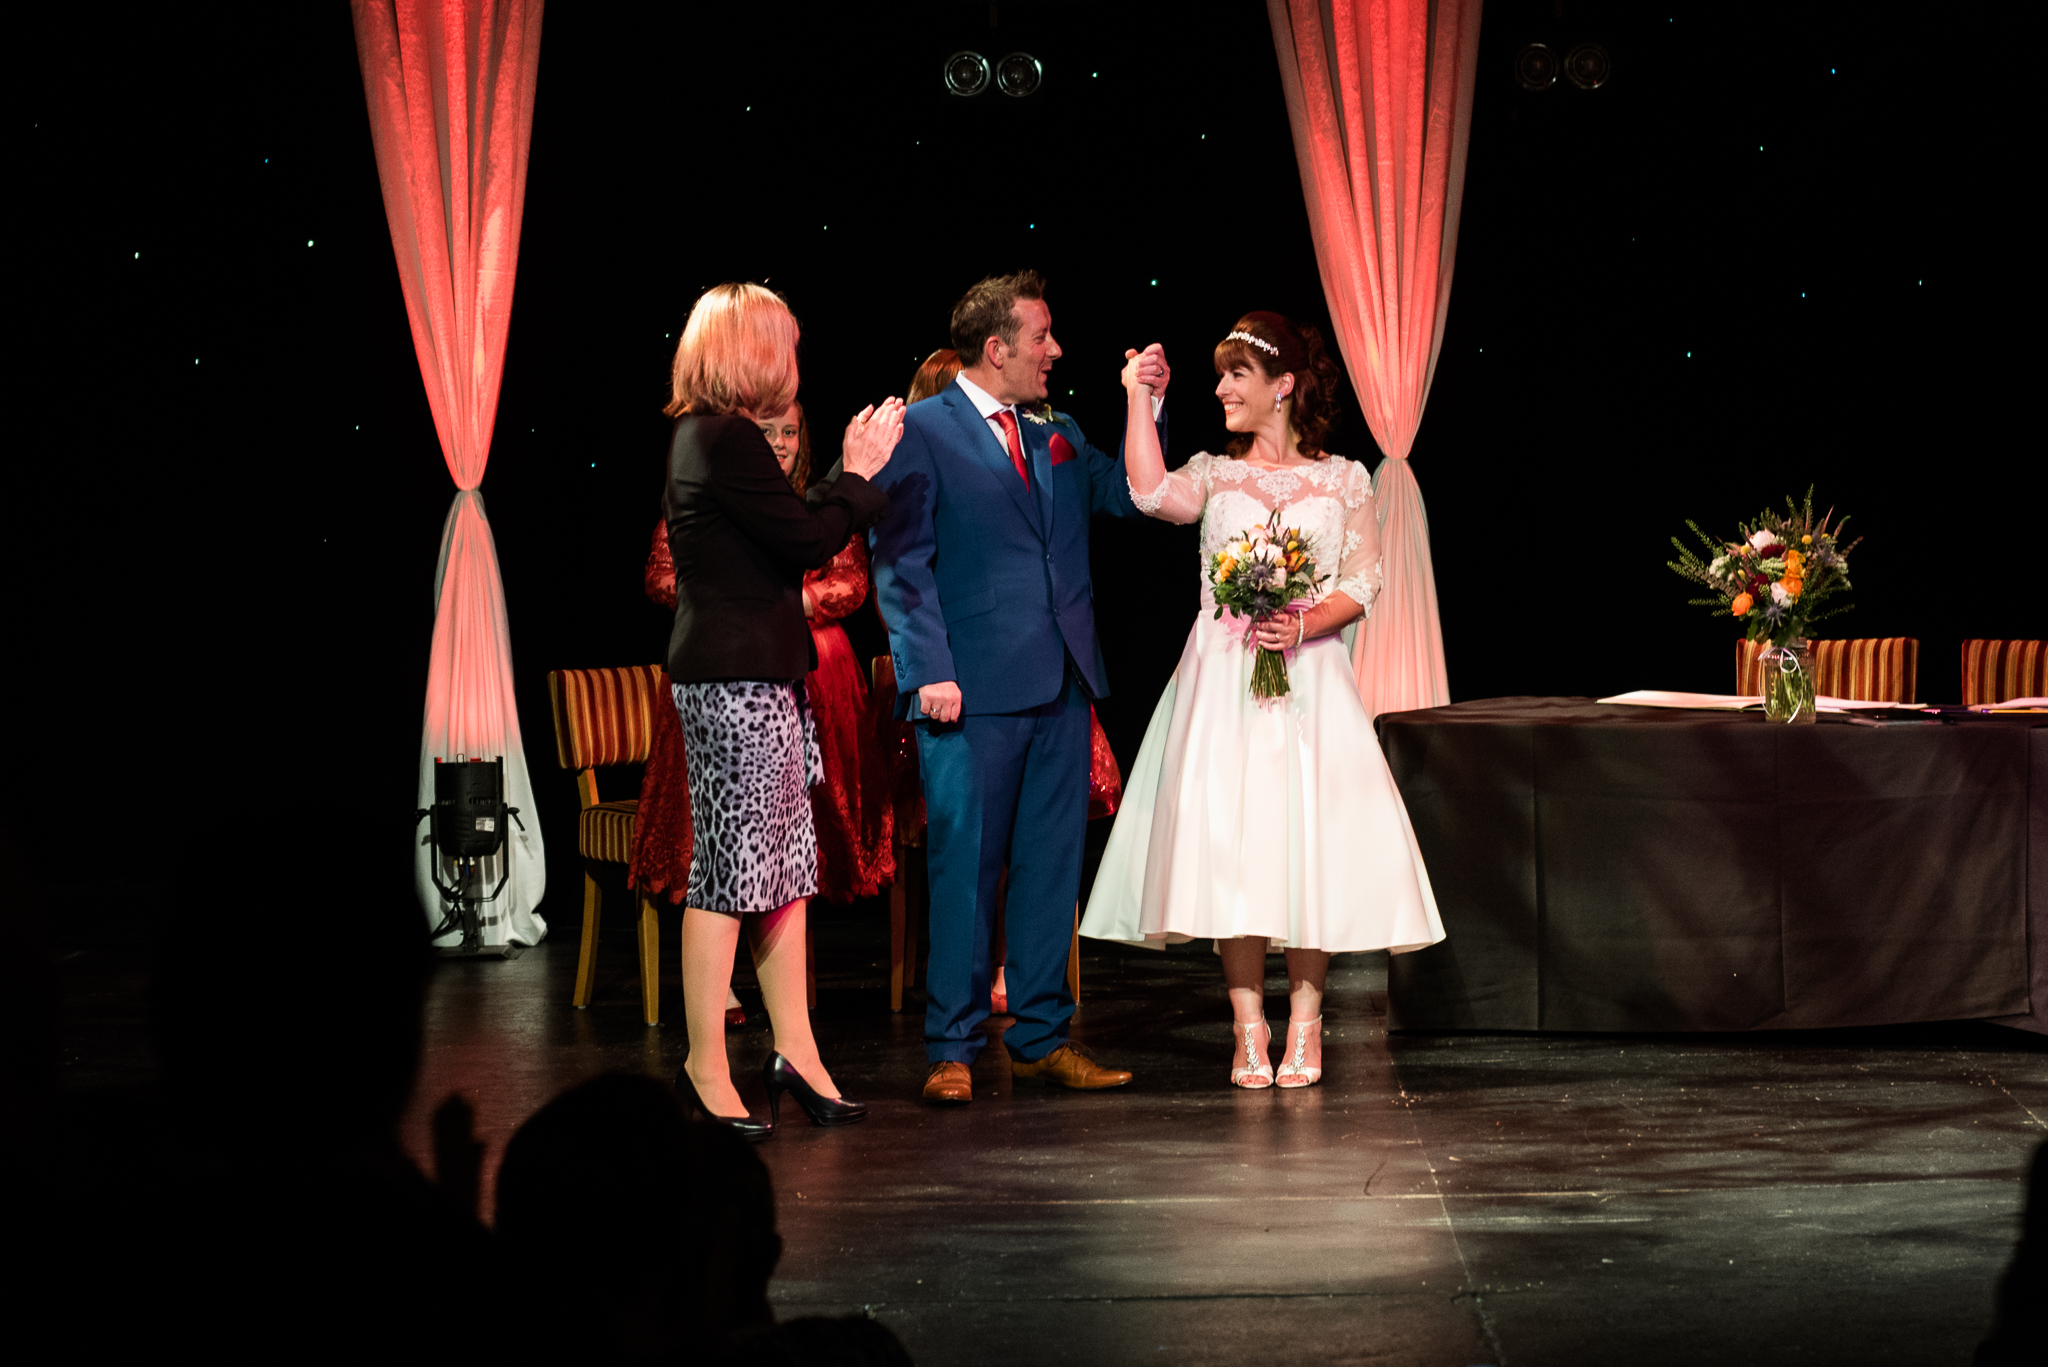 Cheshire Wedding Photography at Crewe Lyceum Theatre Stage Wedding Art Deco 20s - Jenny Harper-25.jpg